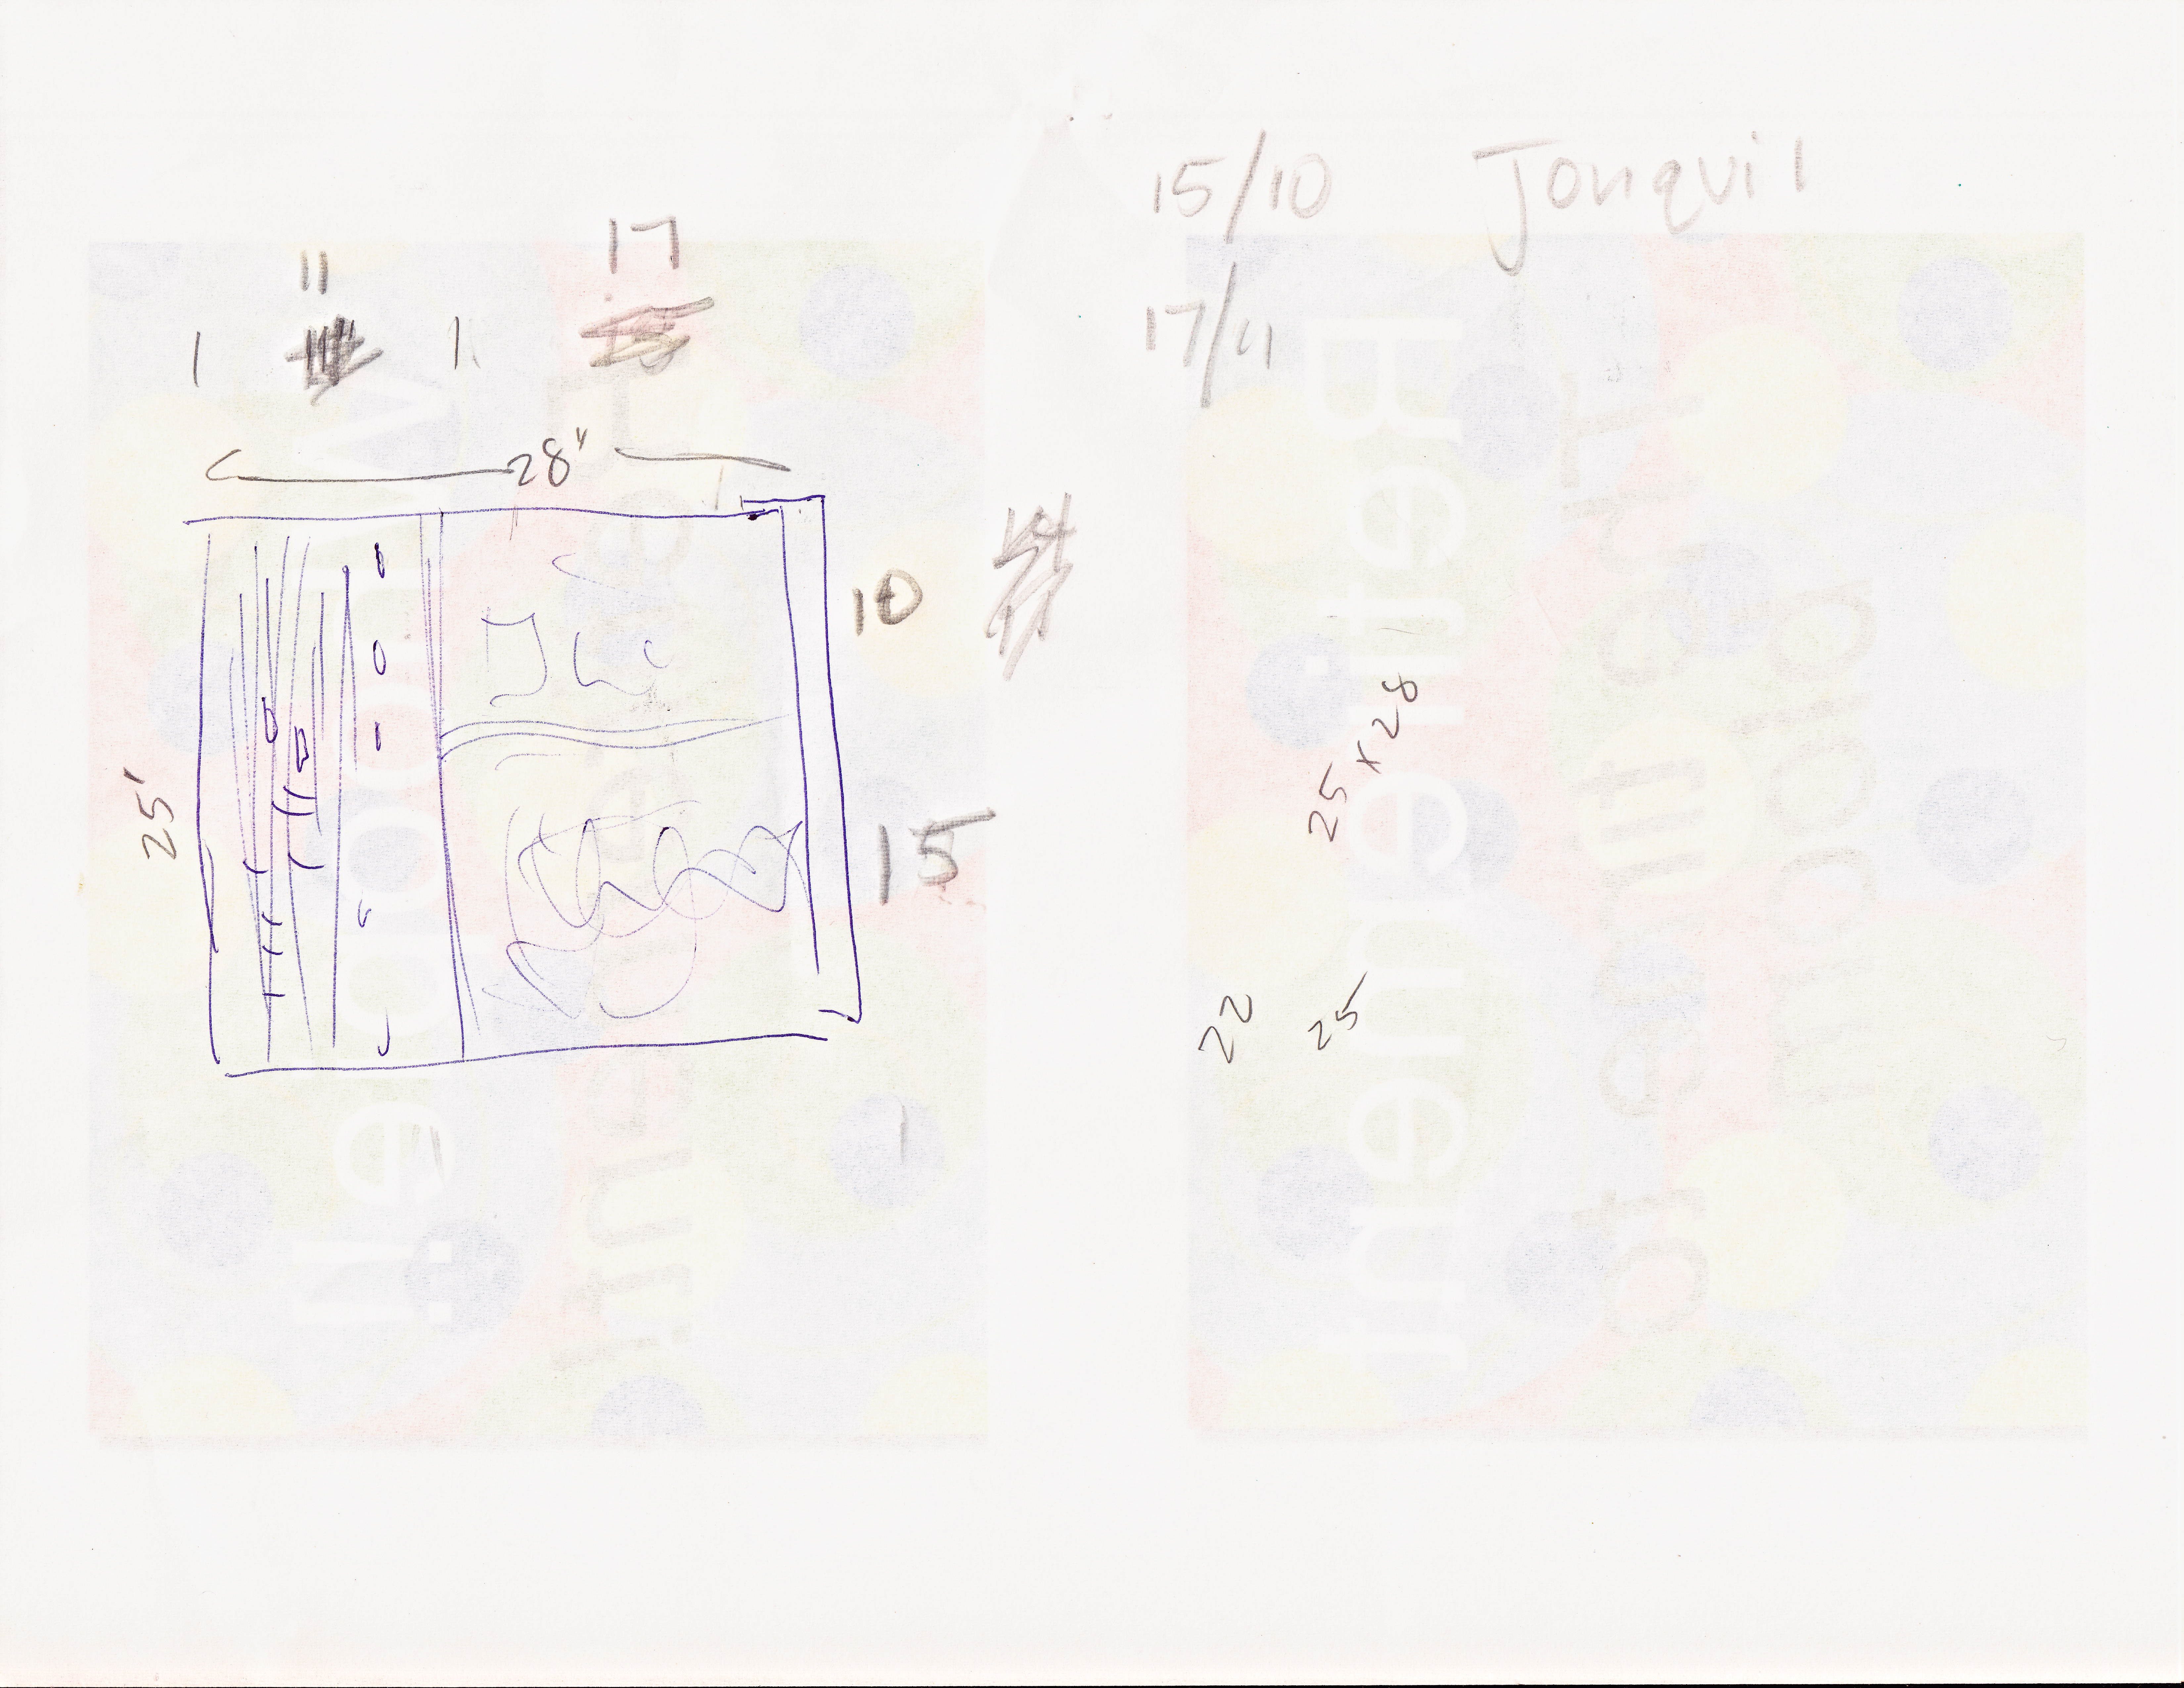 Jonquils sketch